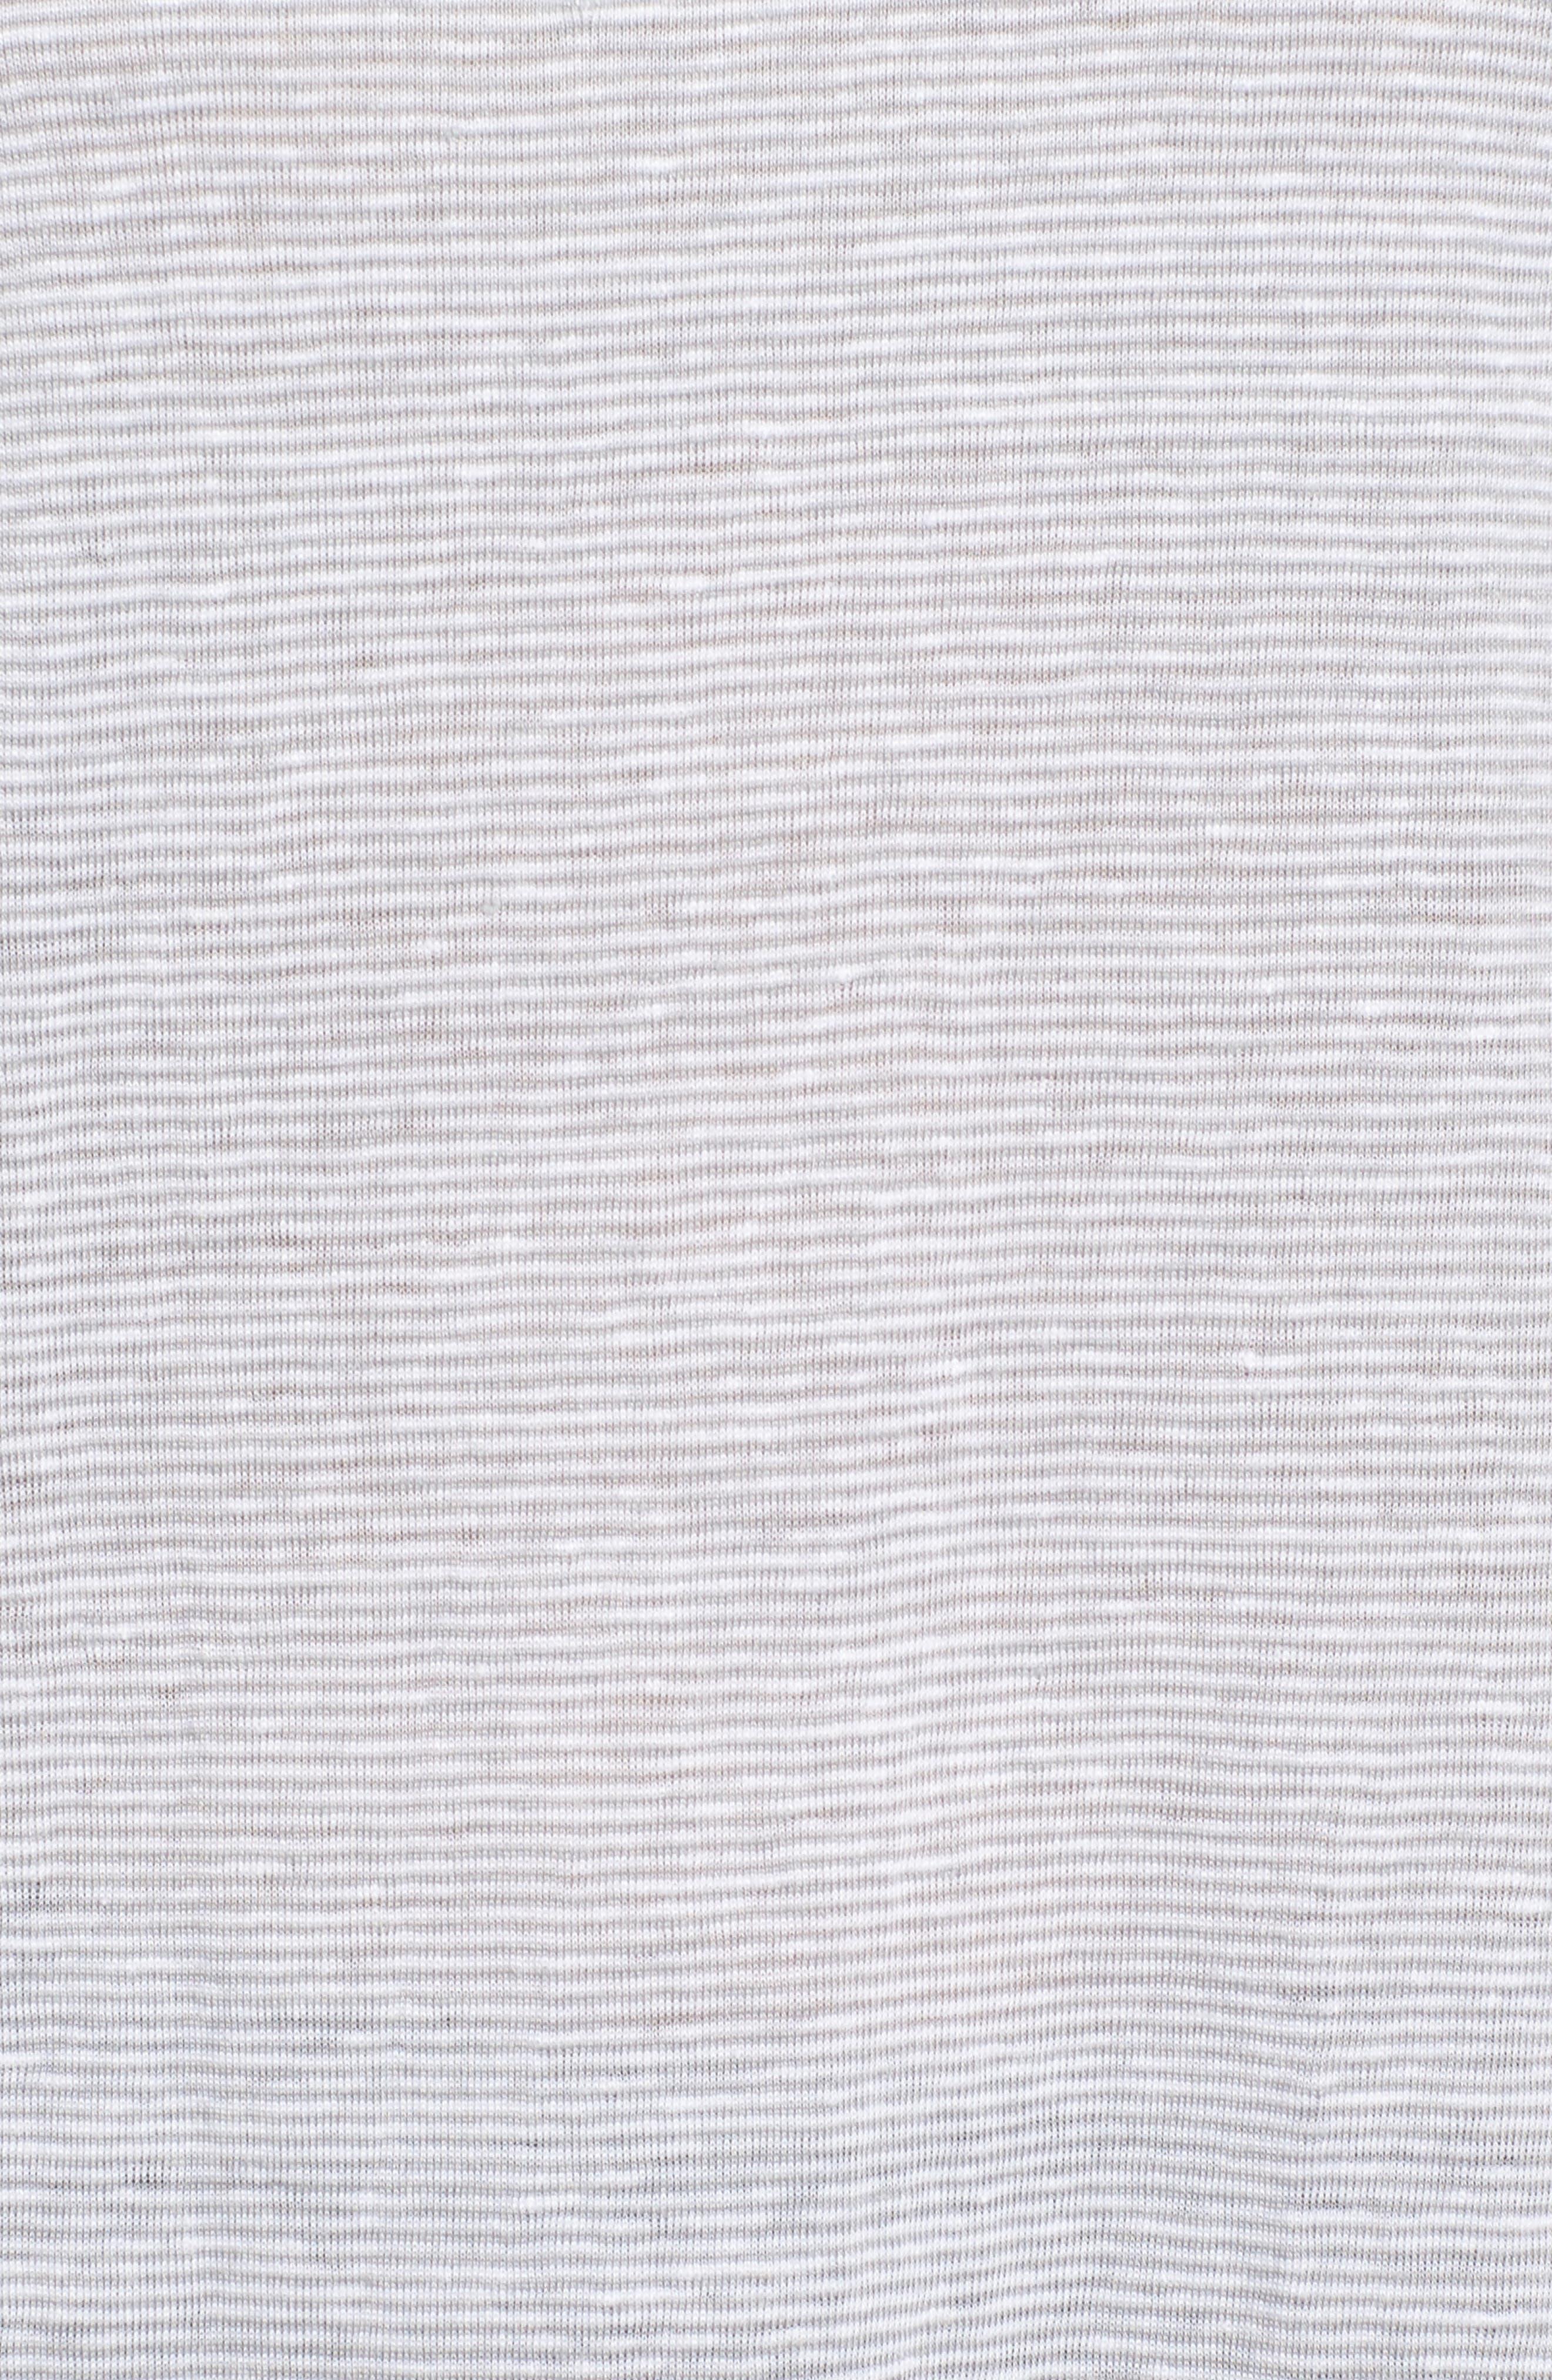 Organic Linen Bateau Neck Top,                             Alternate thumbnail 5, color,                             022